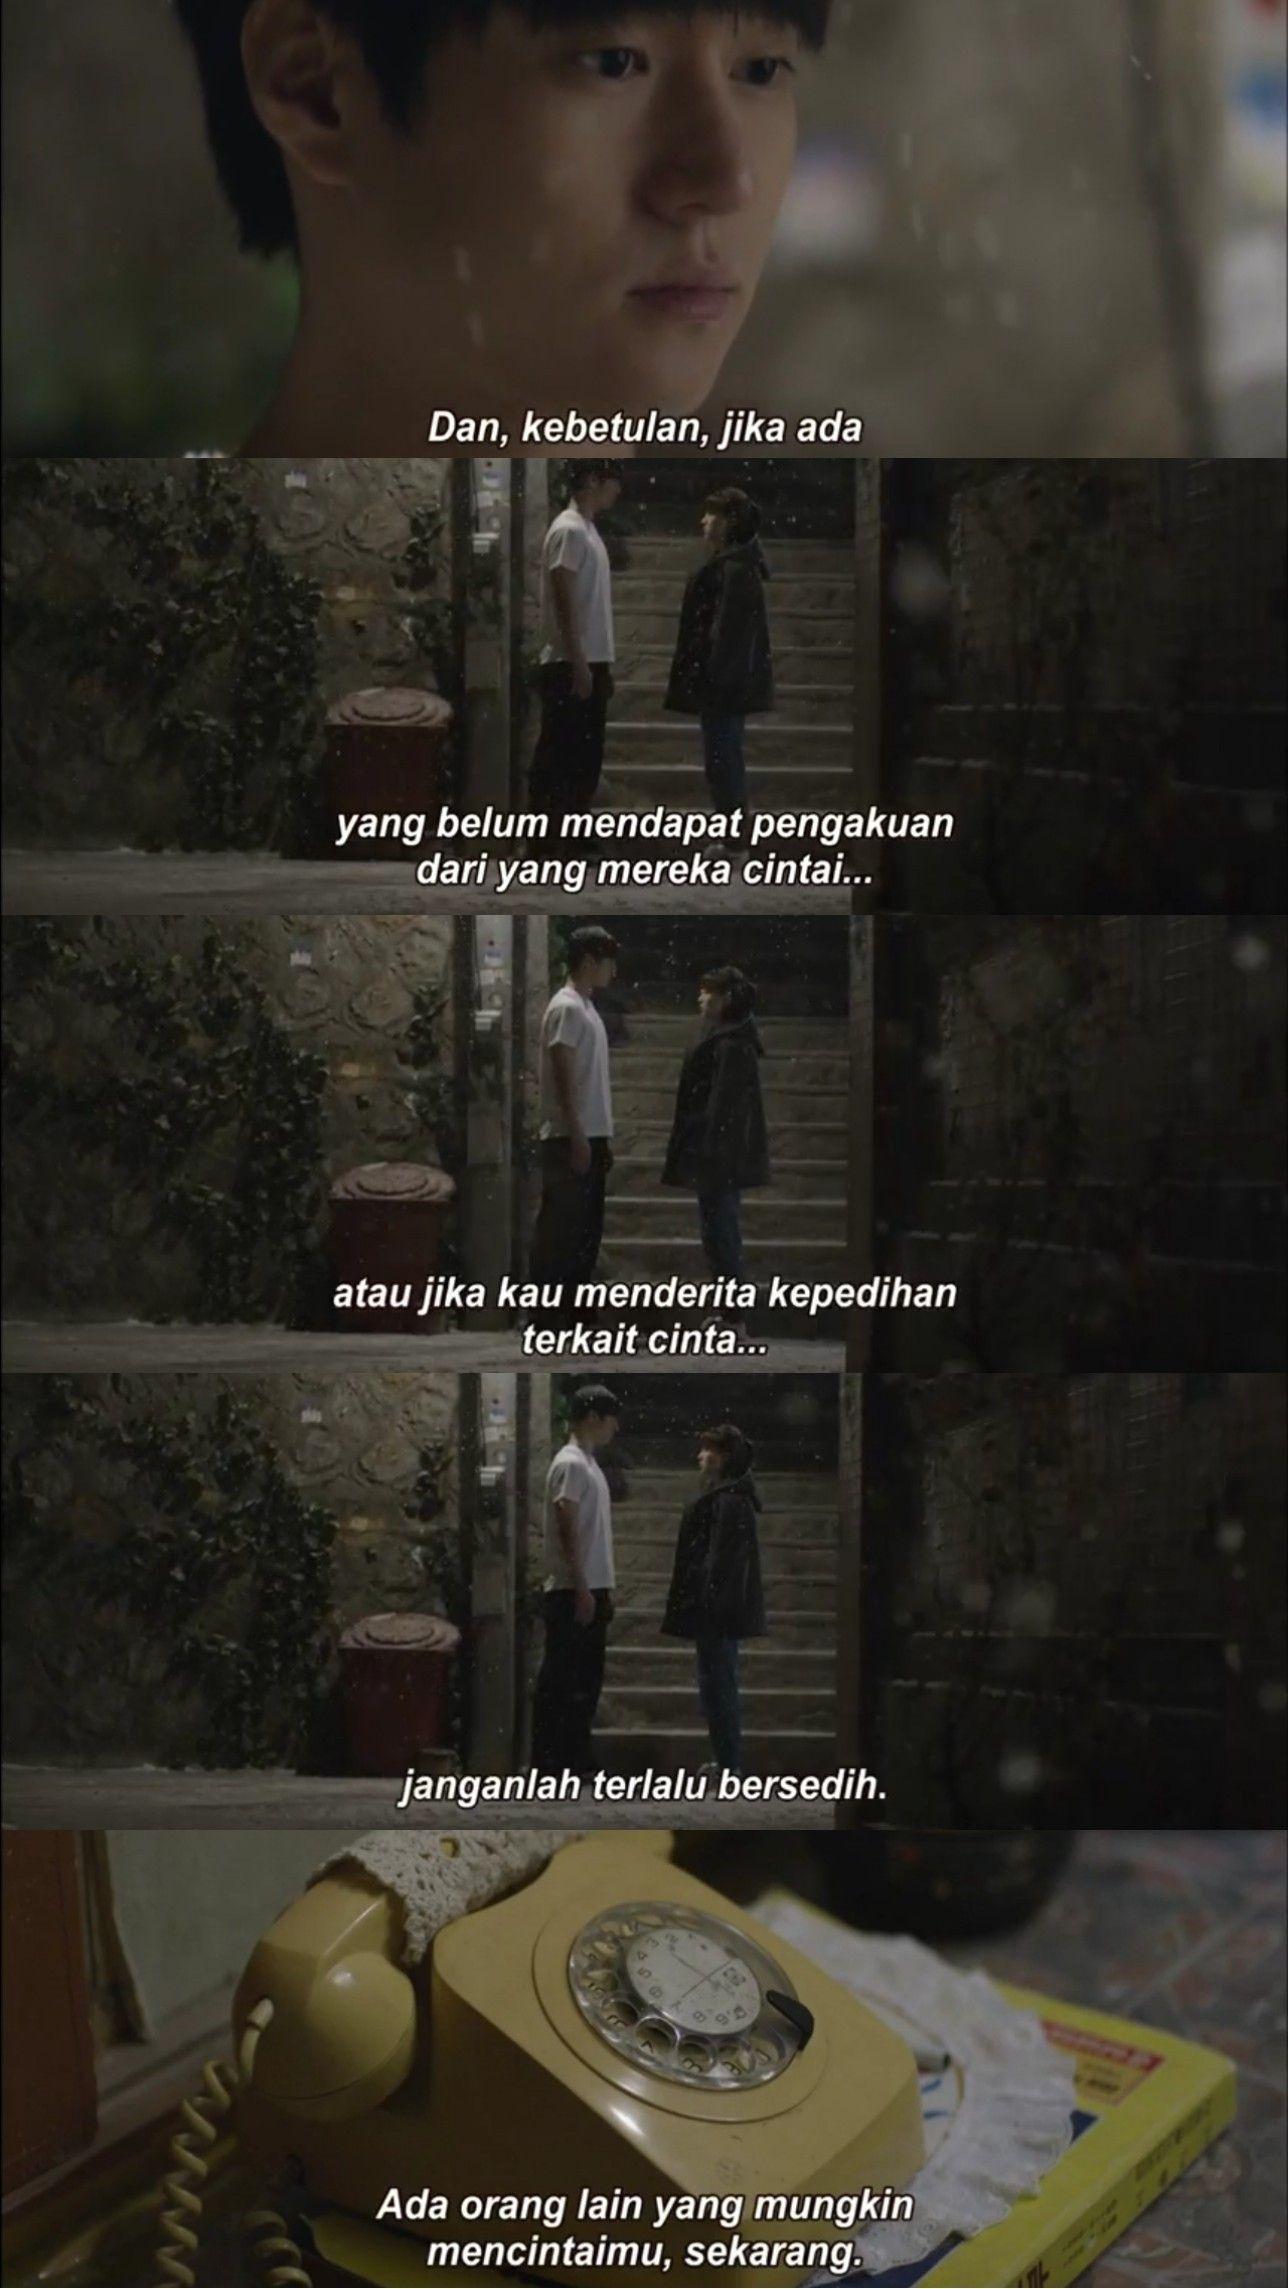 Reply 1988 Subtitle Indonesia : reply, subtitle, indonesia, Reply, 1988♥️, Kata-kata,, Kutipan, Film,, Motivasi